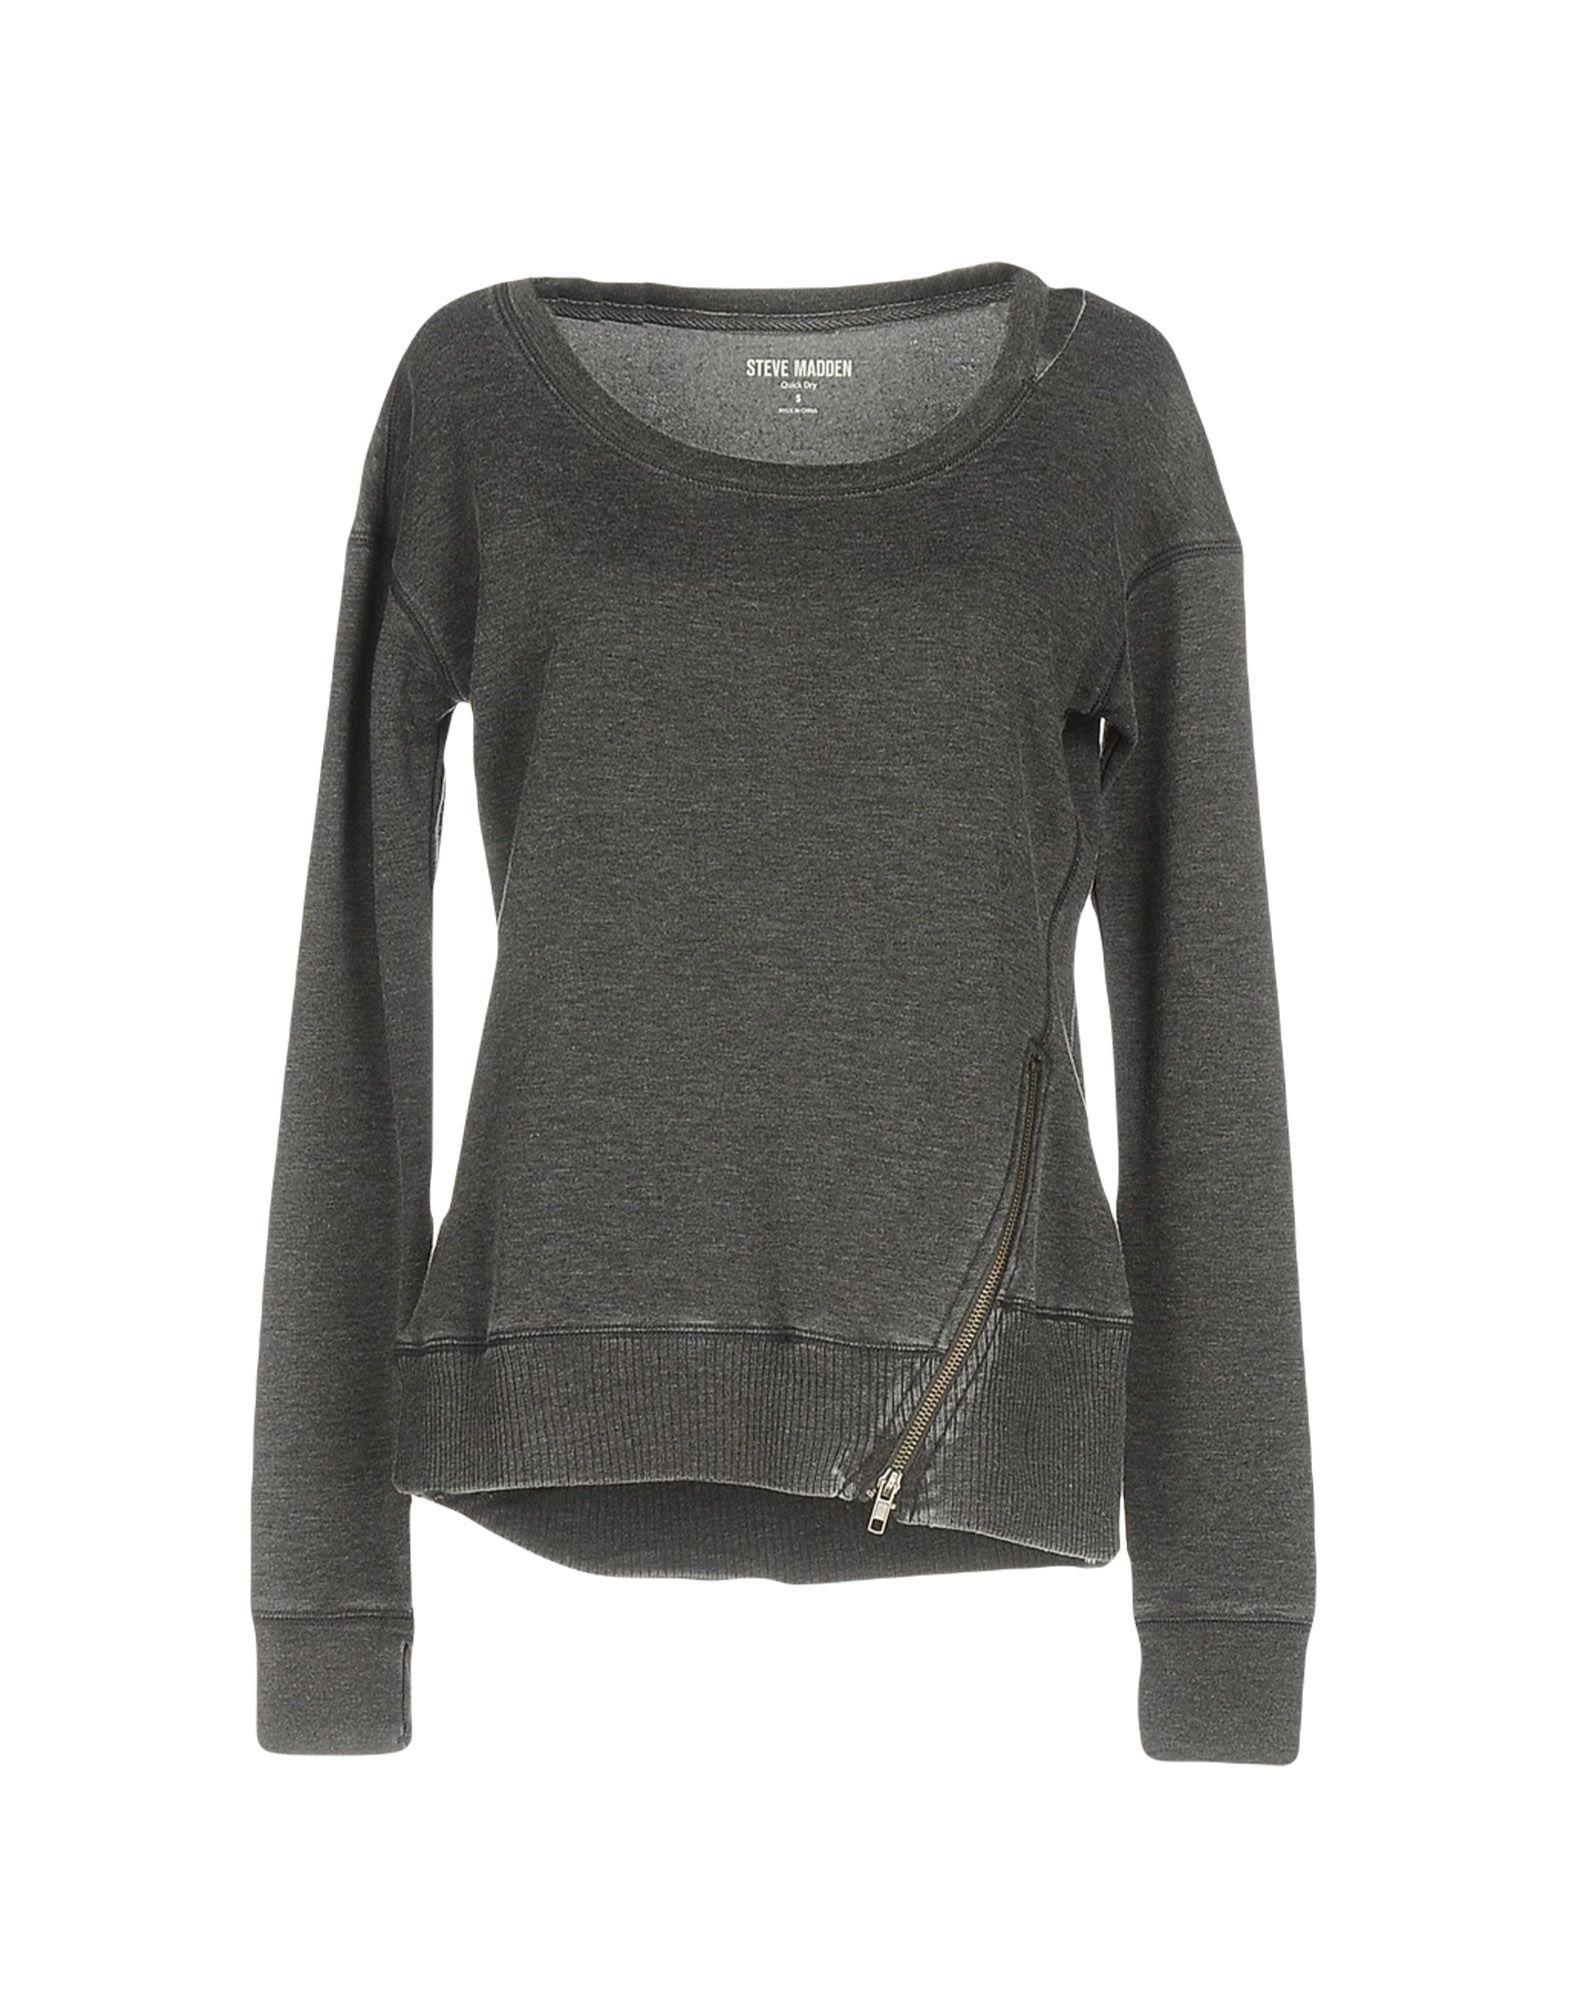 Steve Madden Sweatshirts